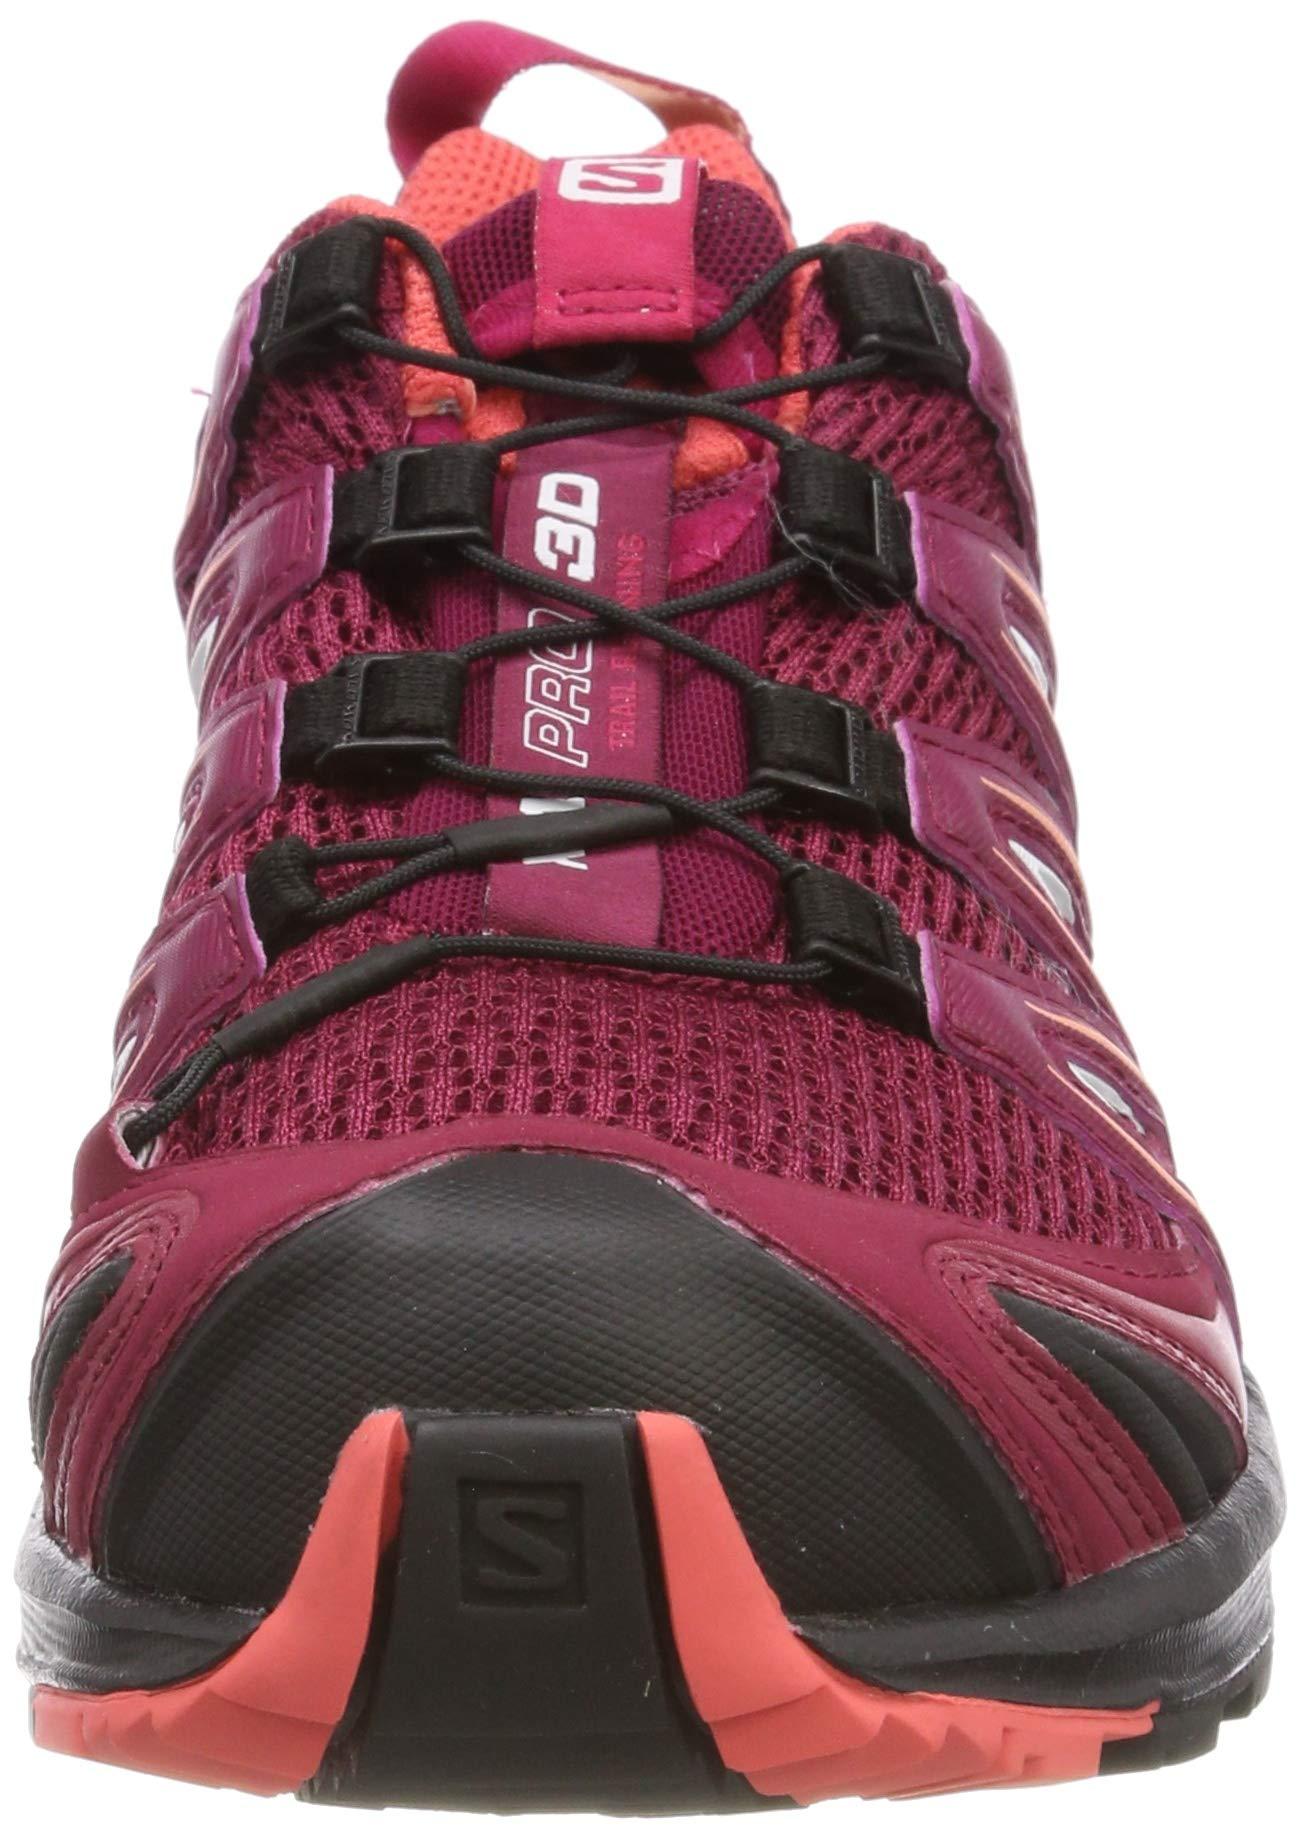 71MrBsokSVL - SALOMON Women's Xa Pro 3D W Trail Running Shoes